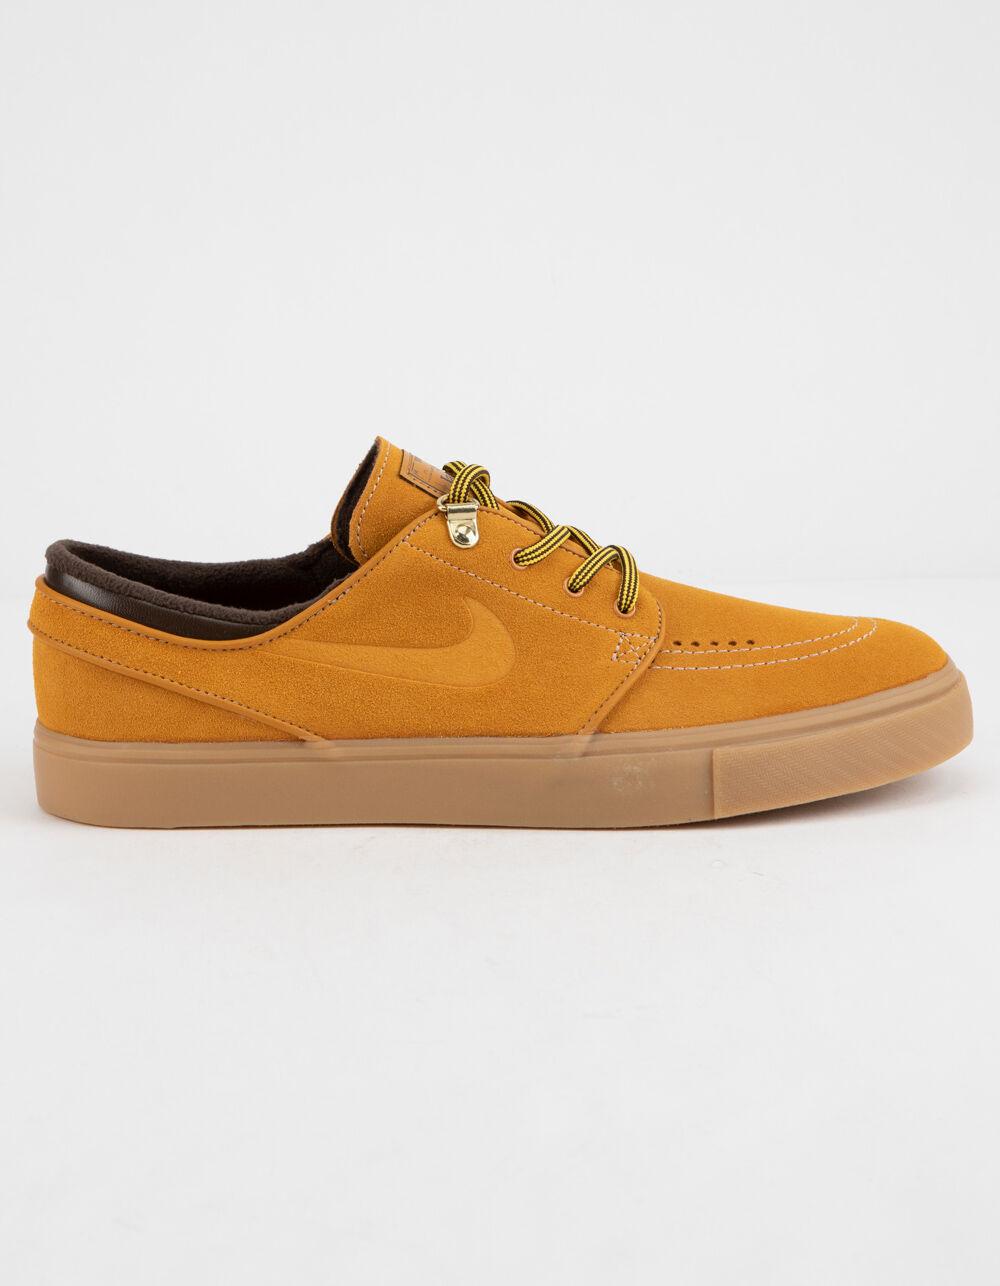 cheap for discount 15521 f5874 NIKE SB Zoom Janoski Premium Bronze Gum Light Brown Shoes (33187046501)  photo